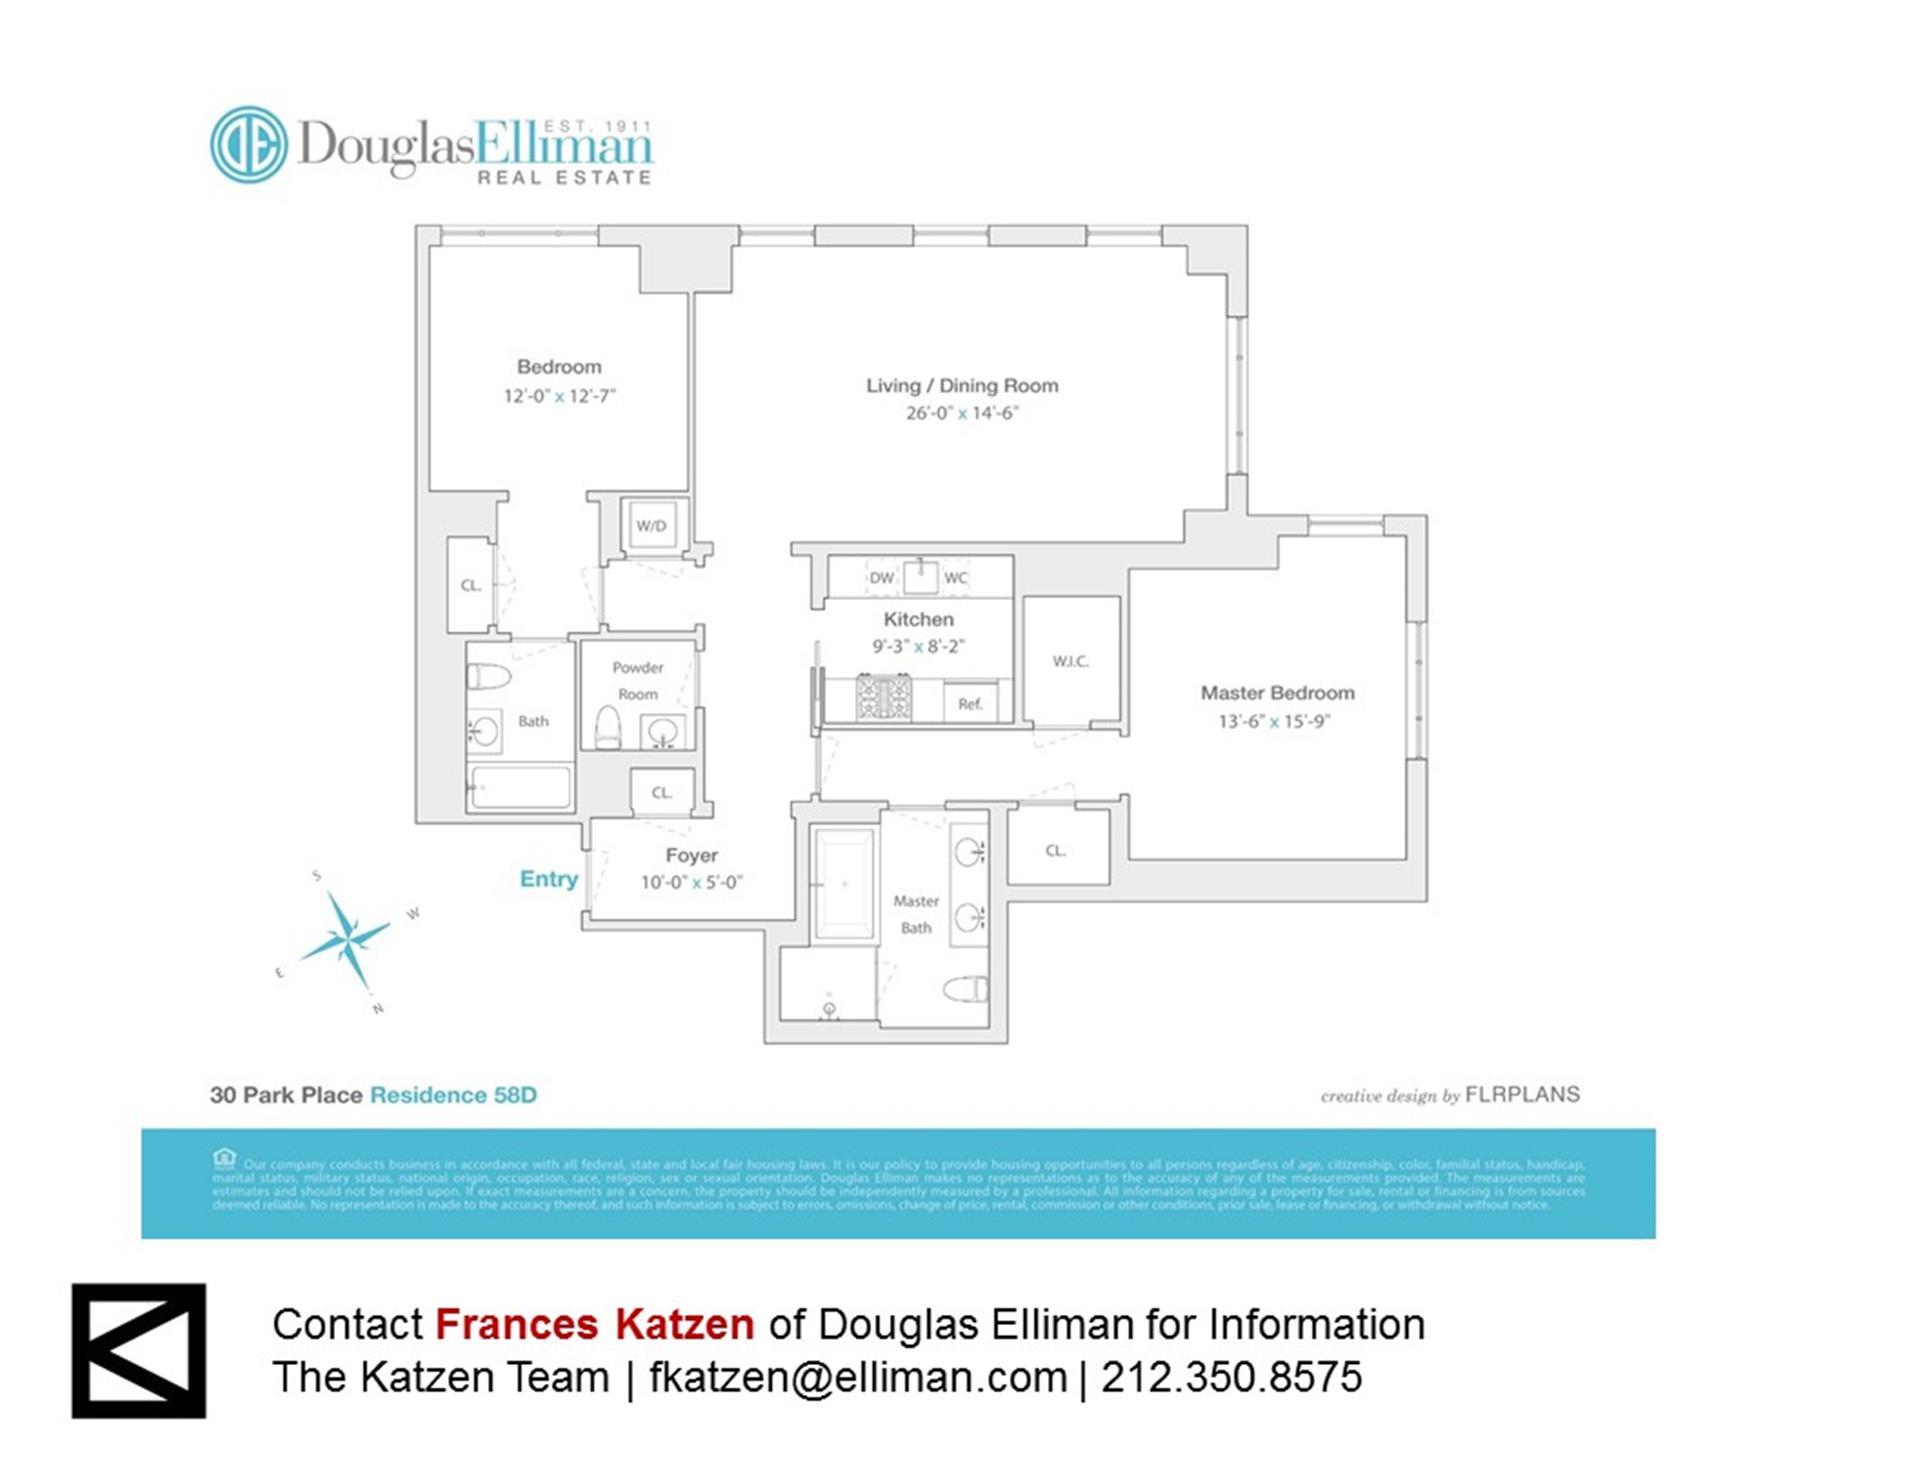 Floor plan of Four Seasons, 30 Park Pl, 58D - TriBeCa, New York